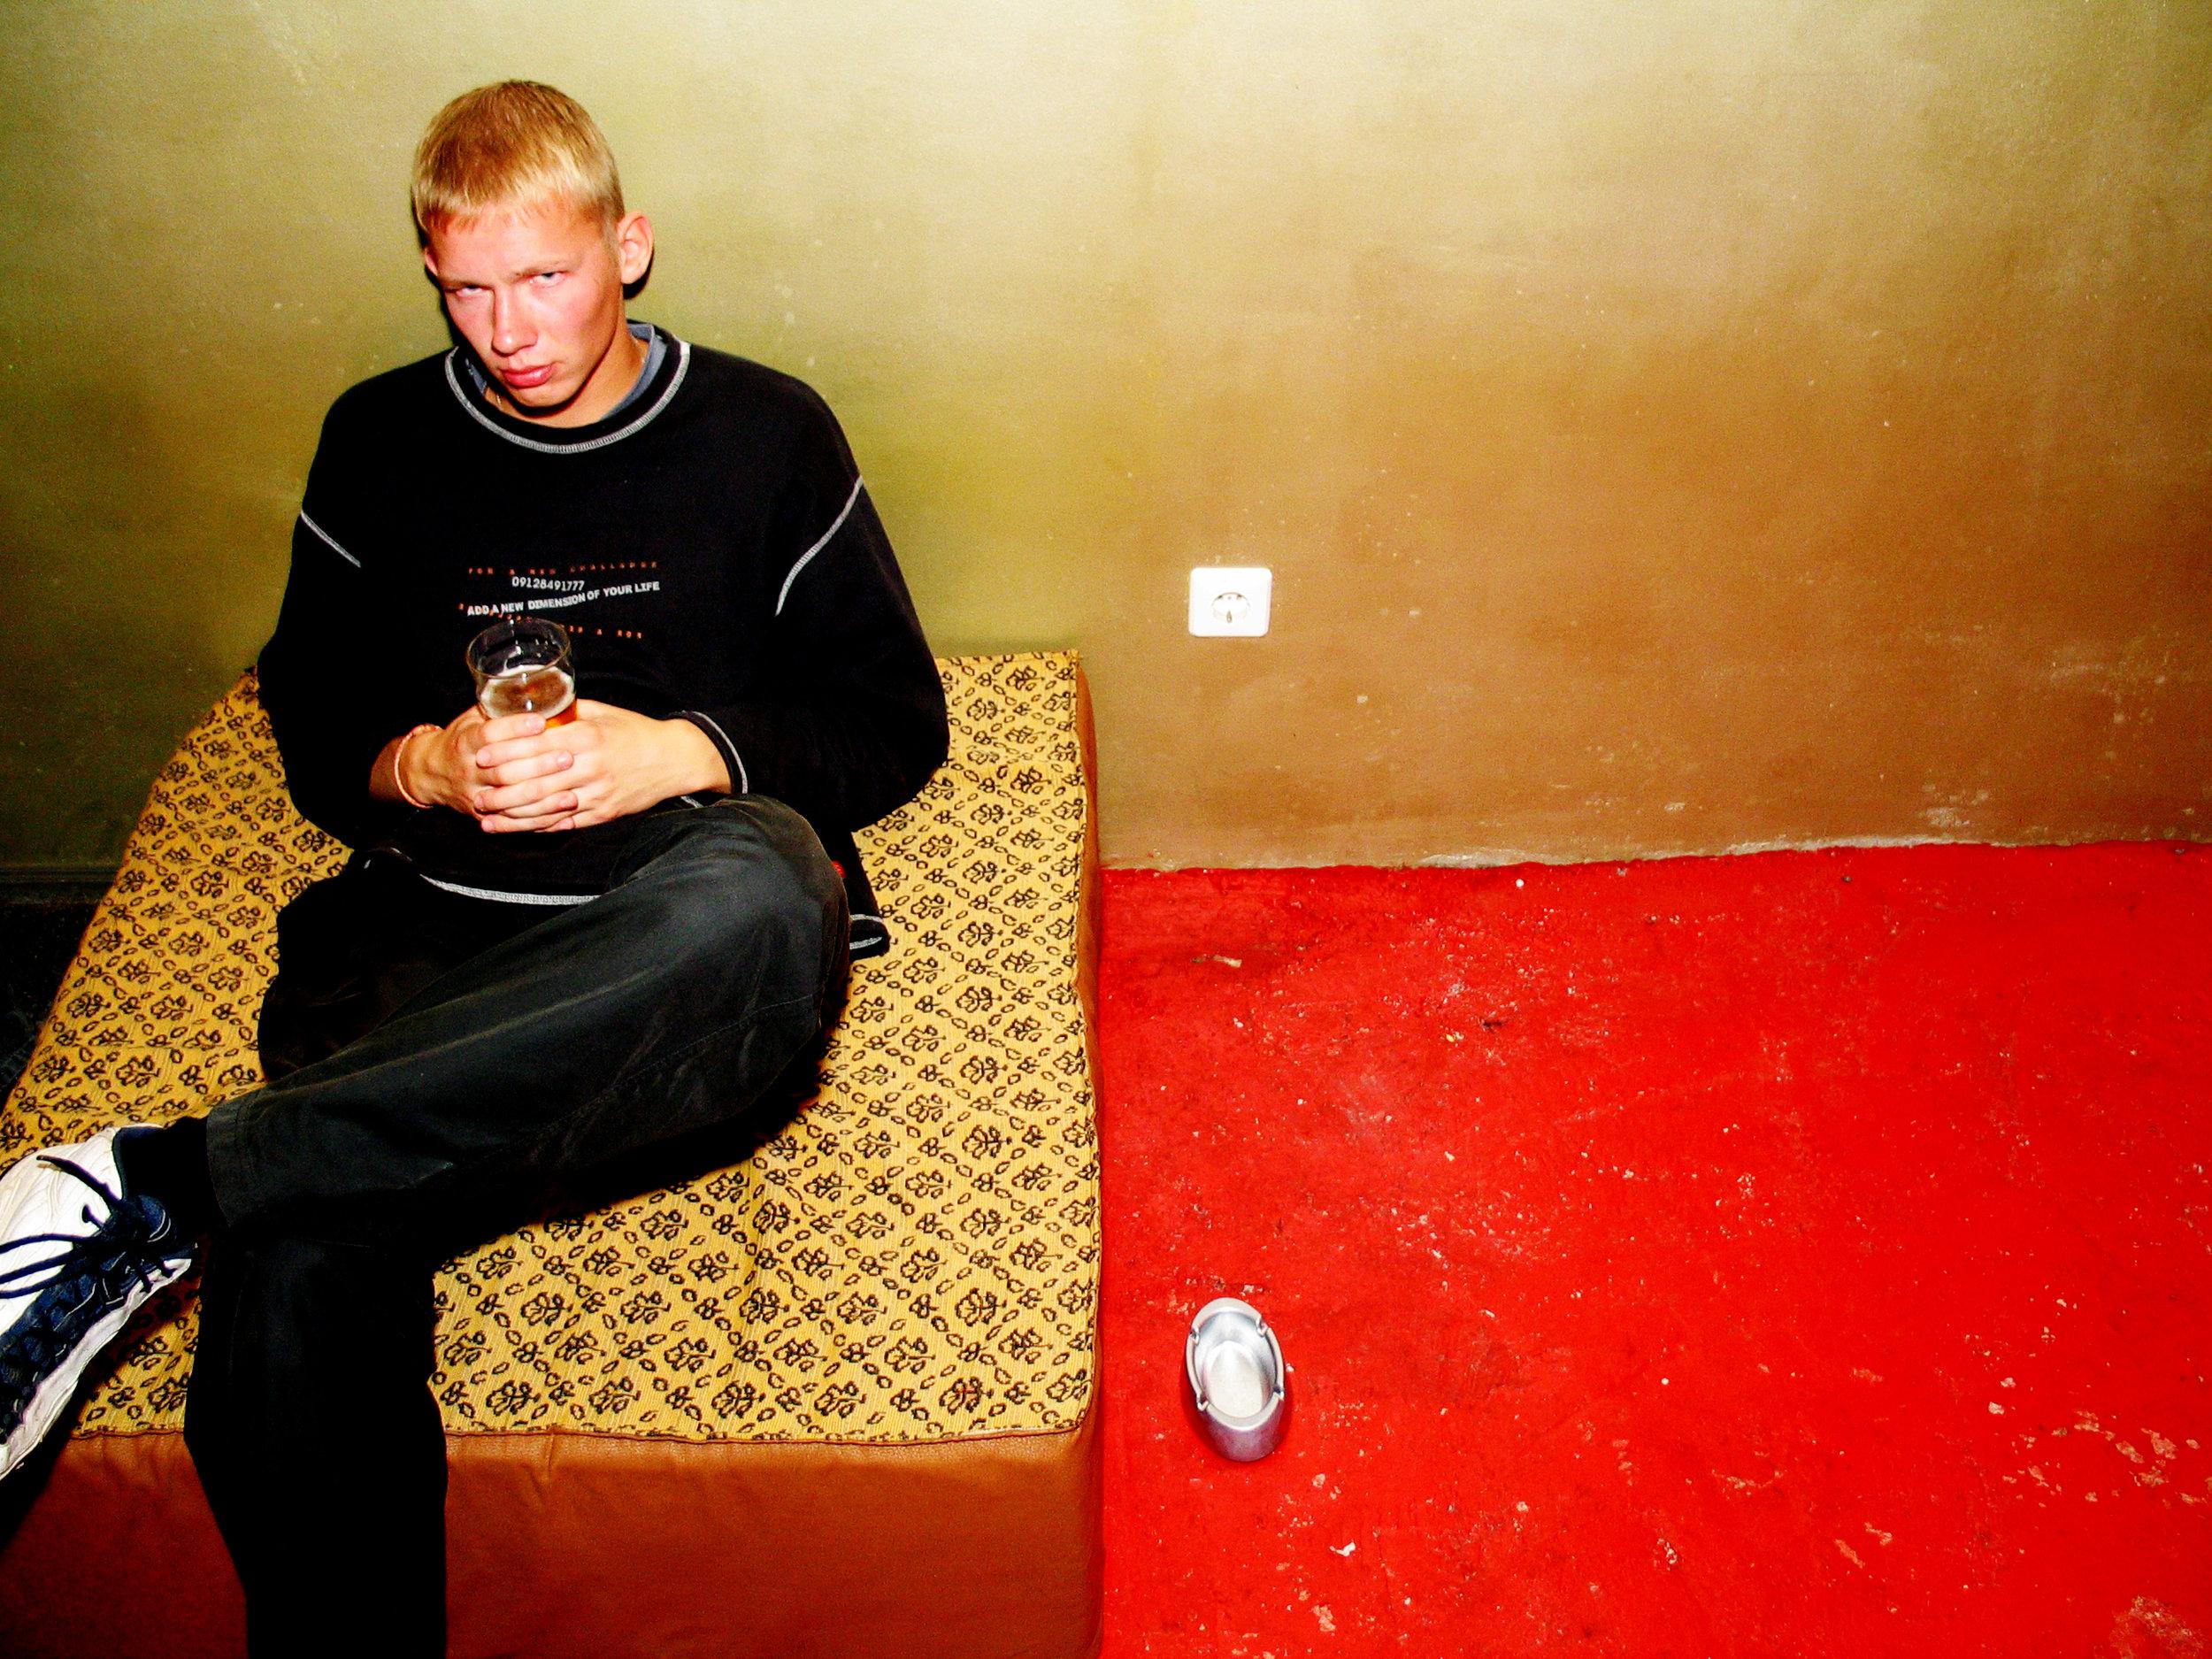 Club Tallinn, Tartu, Estonia, September 2003